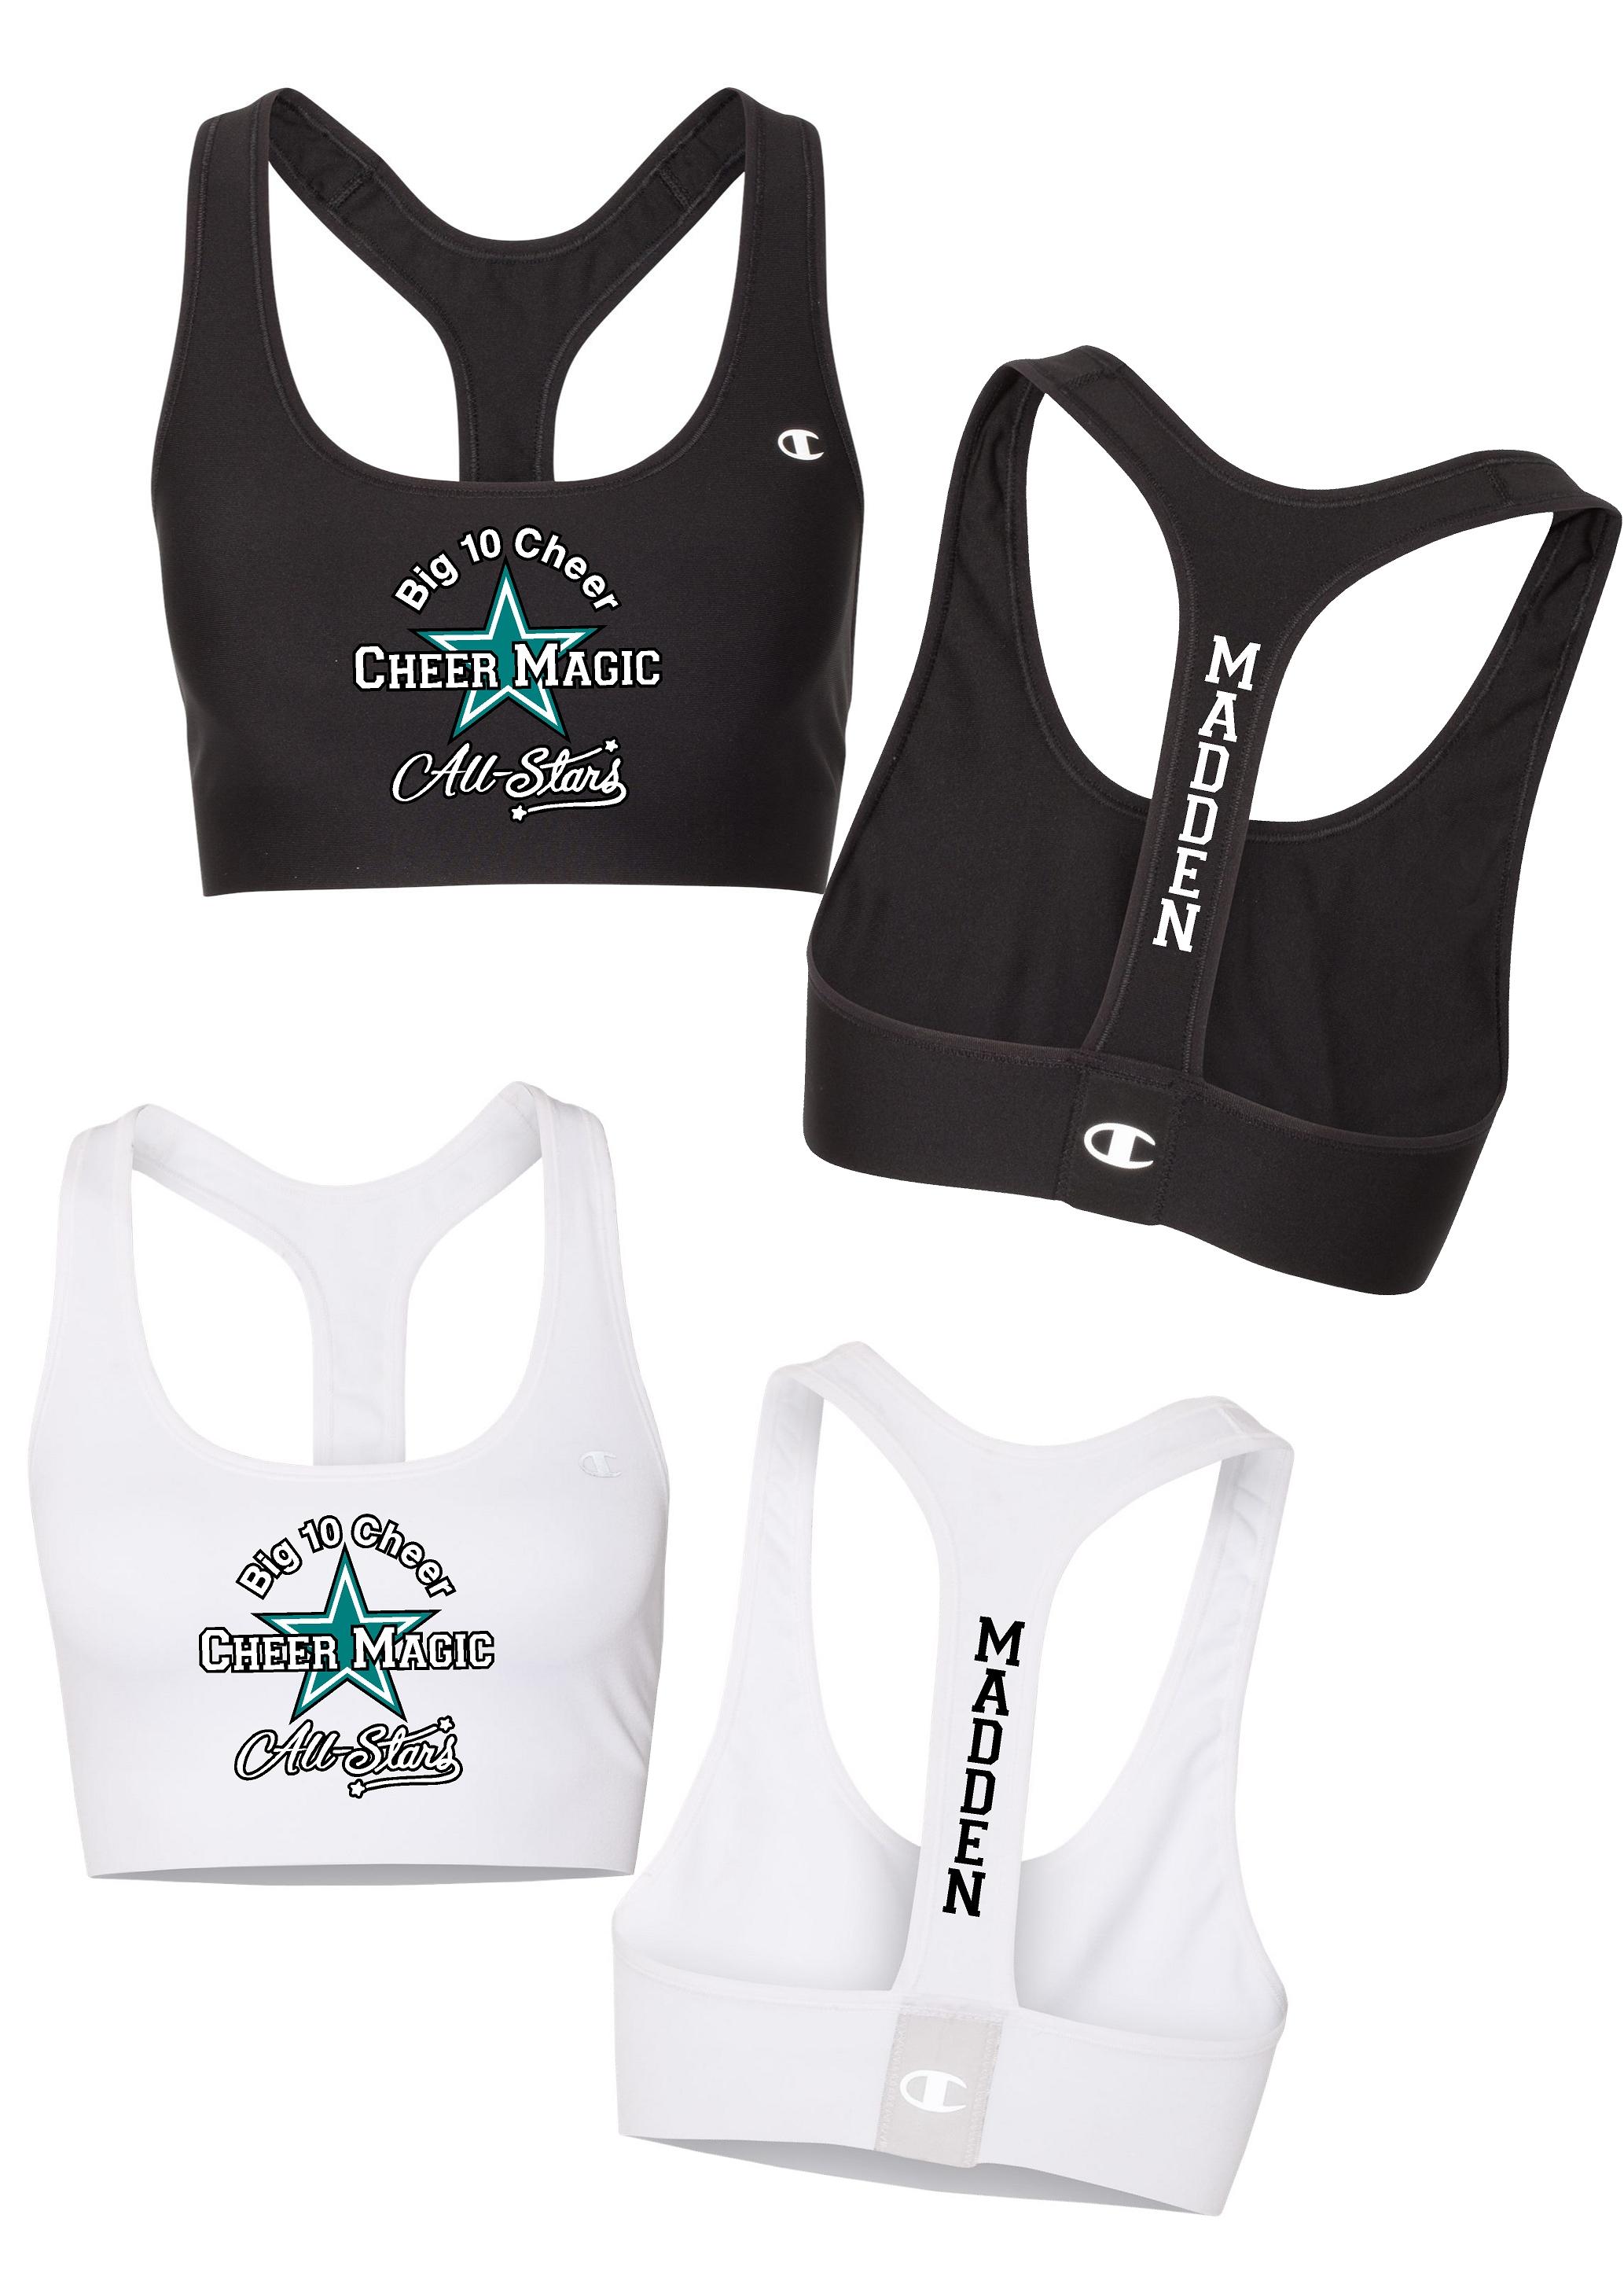 38273e1723d9b CMA All-Stars Champion Ladies Sports Bra – Goodwin Glass   Graphics